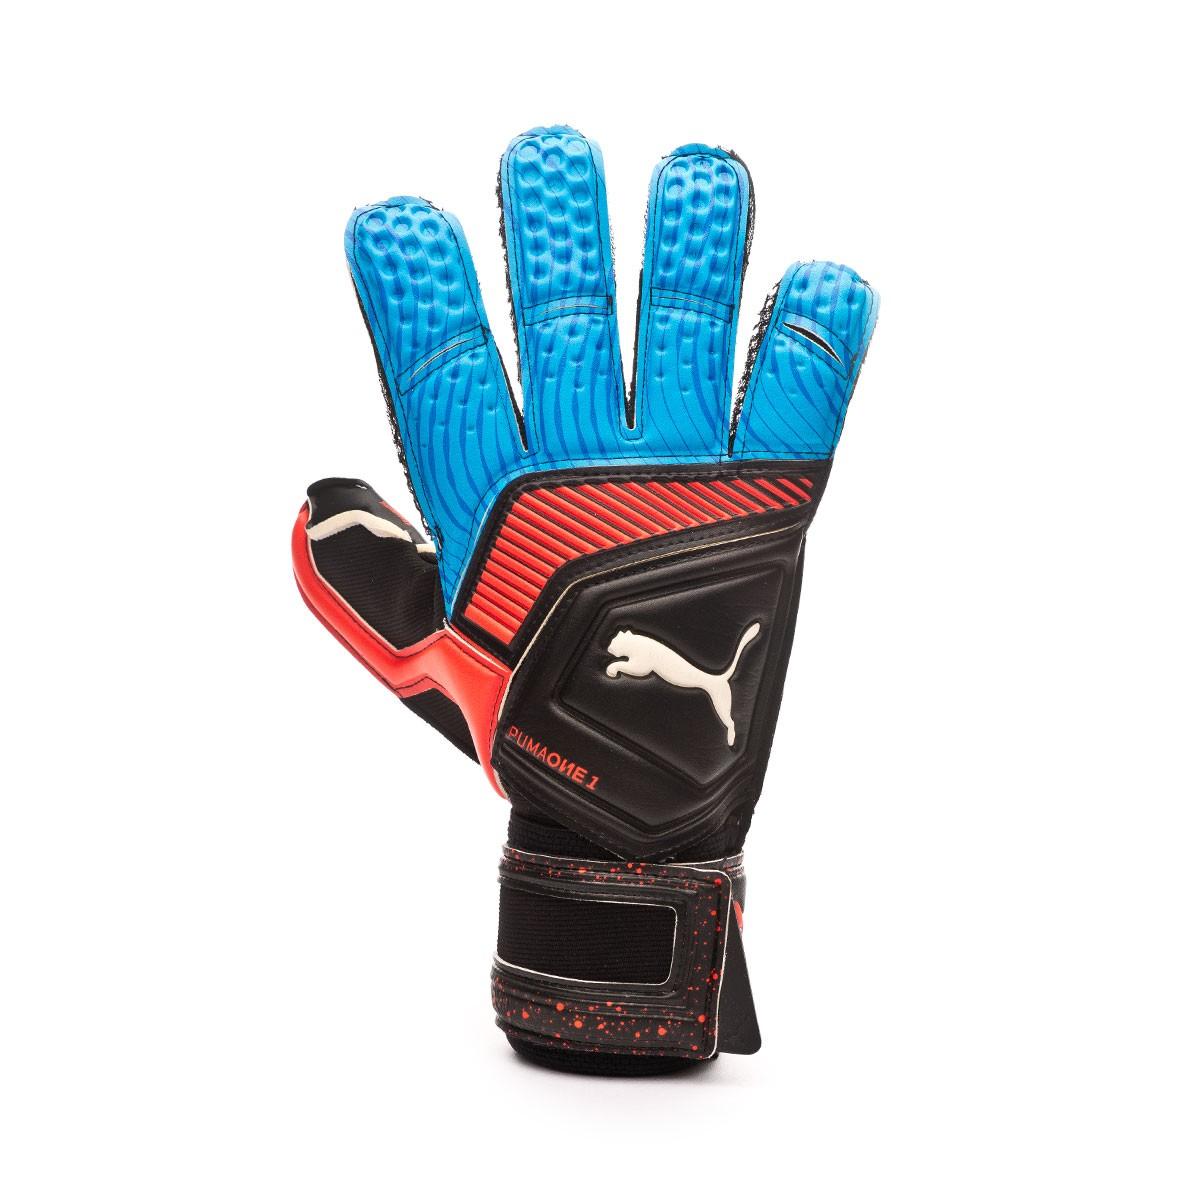 Puma One Grip 1 RC Glove